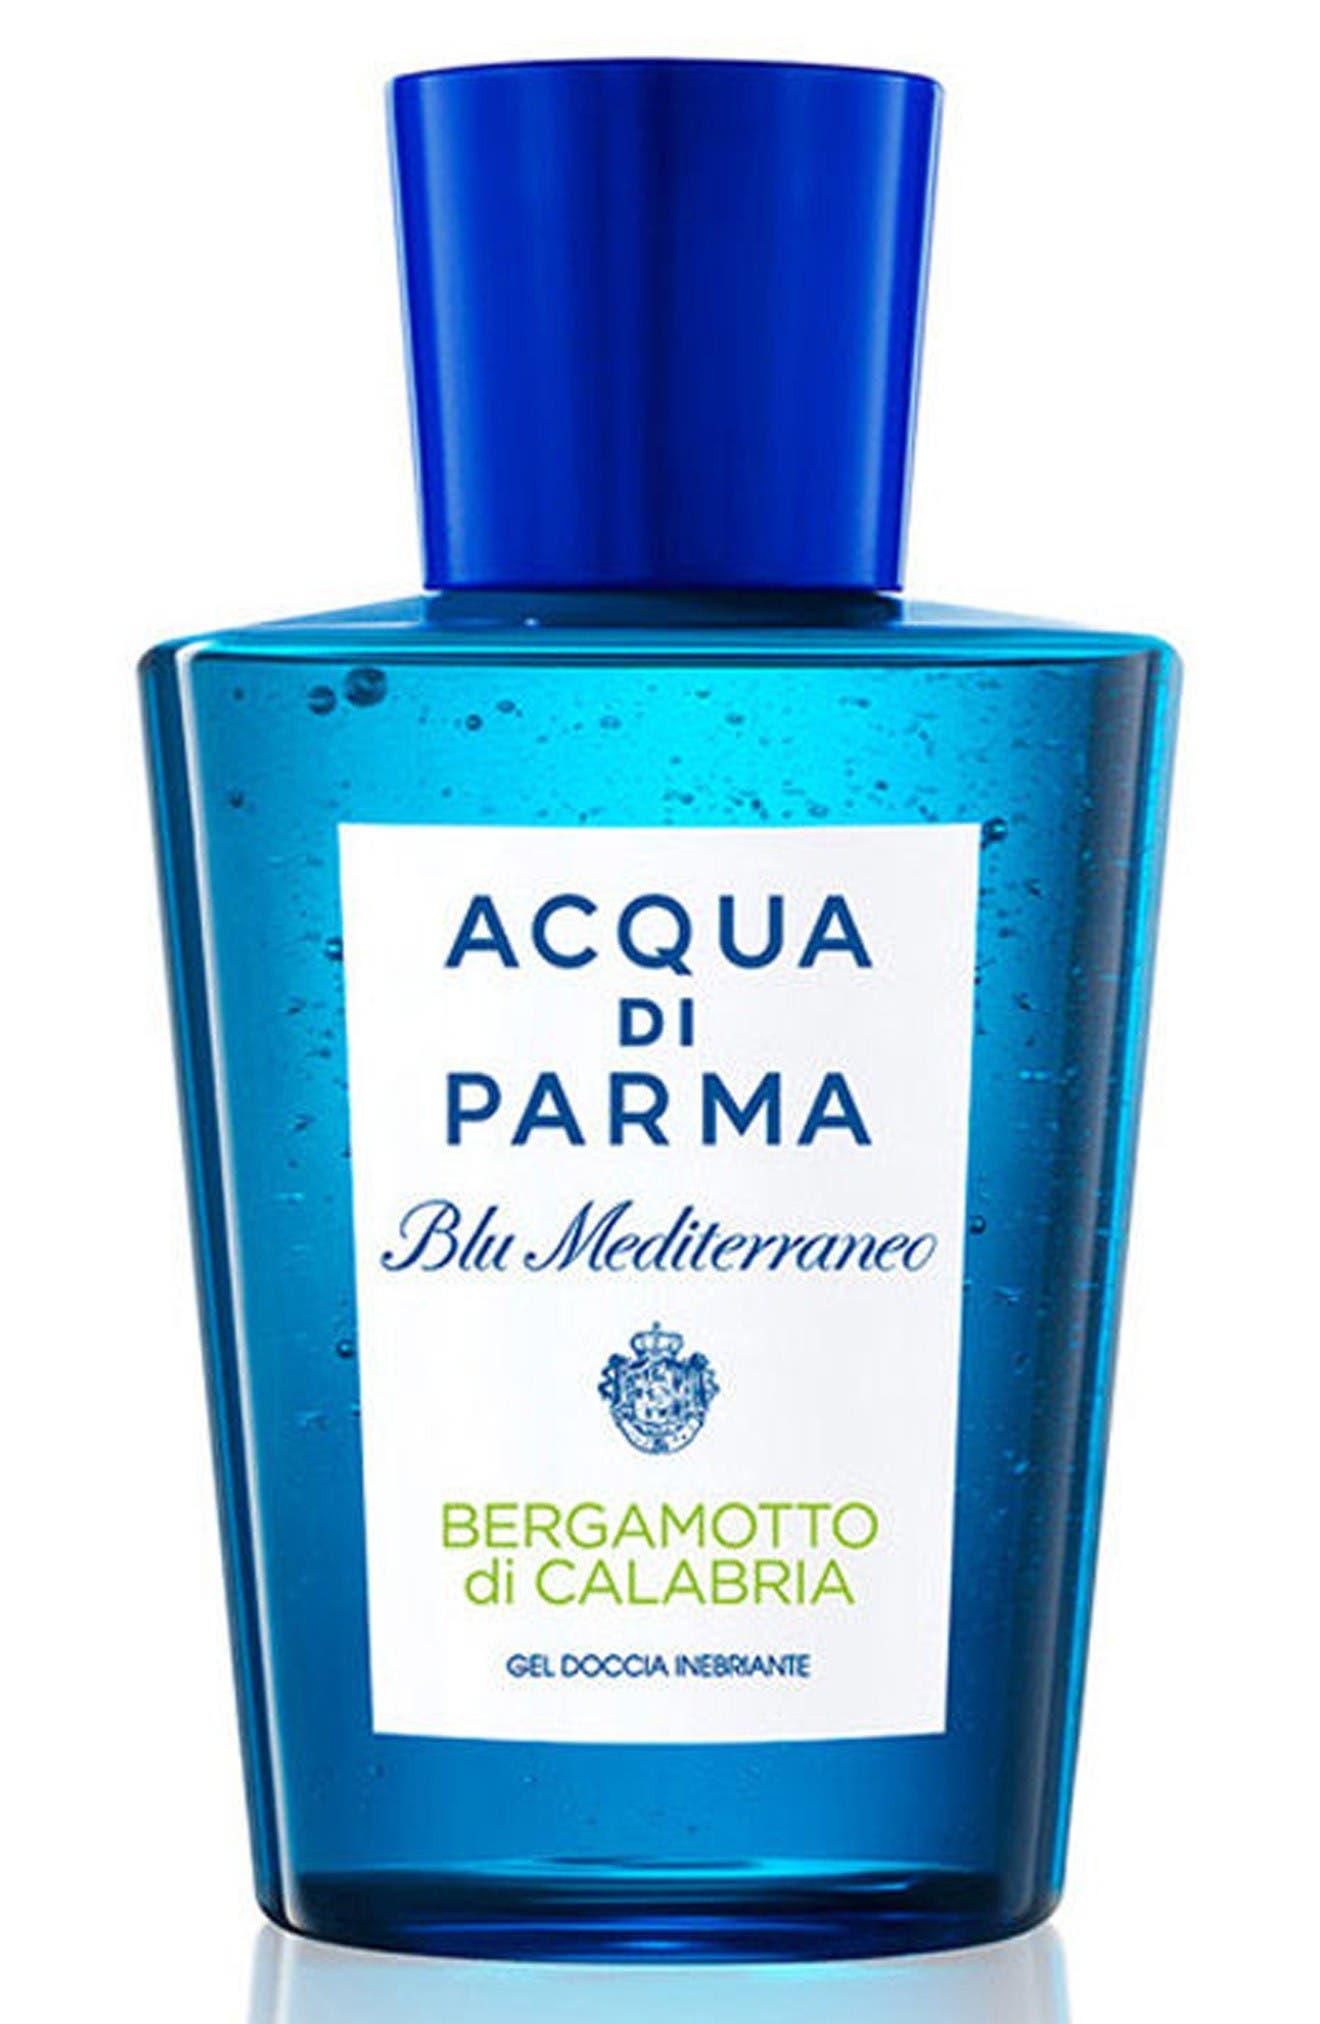 Alternate Image 1 Selected - Acqua di Parma 'Blu Mediterraneo - Bergamotto di Calabria' Shower Gel